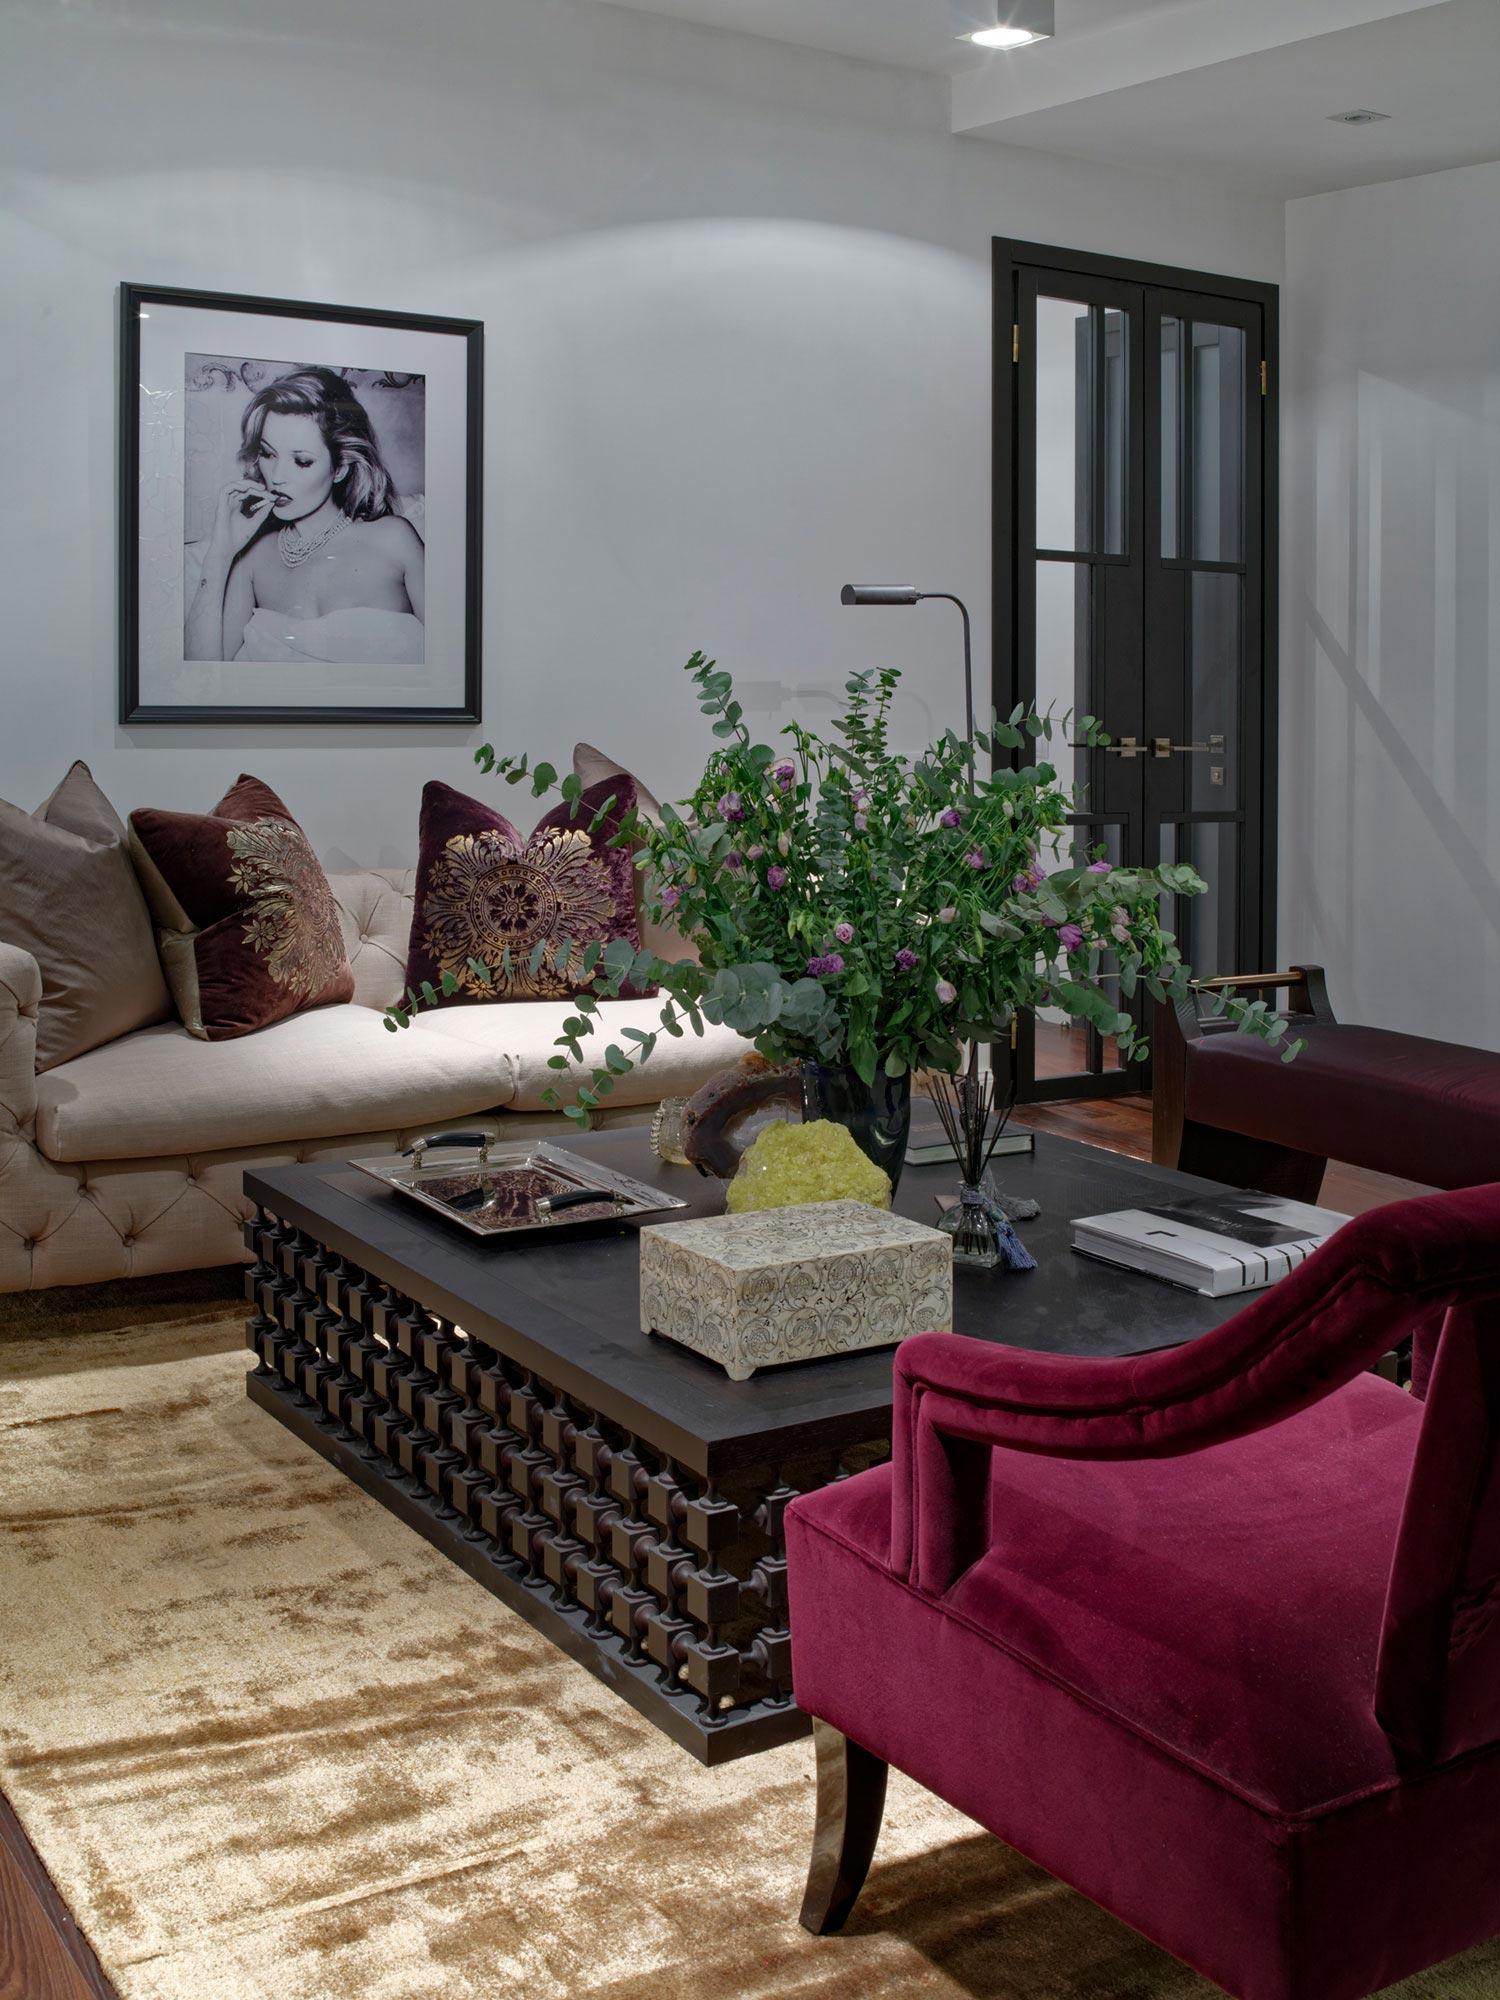 Elegant One-bedroom Apartment In Kiev By Absolute Interior